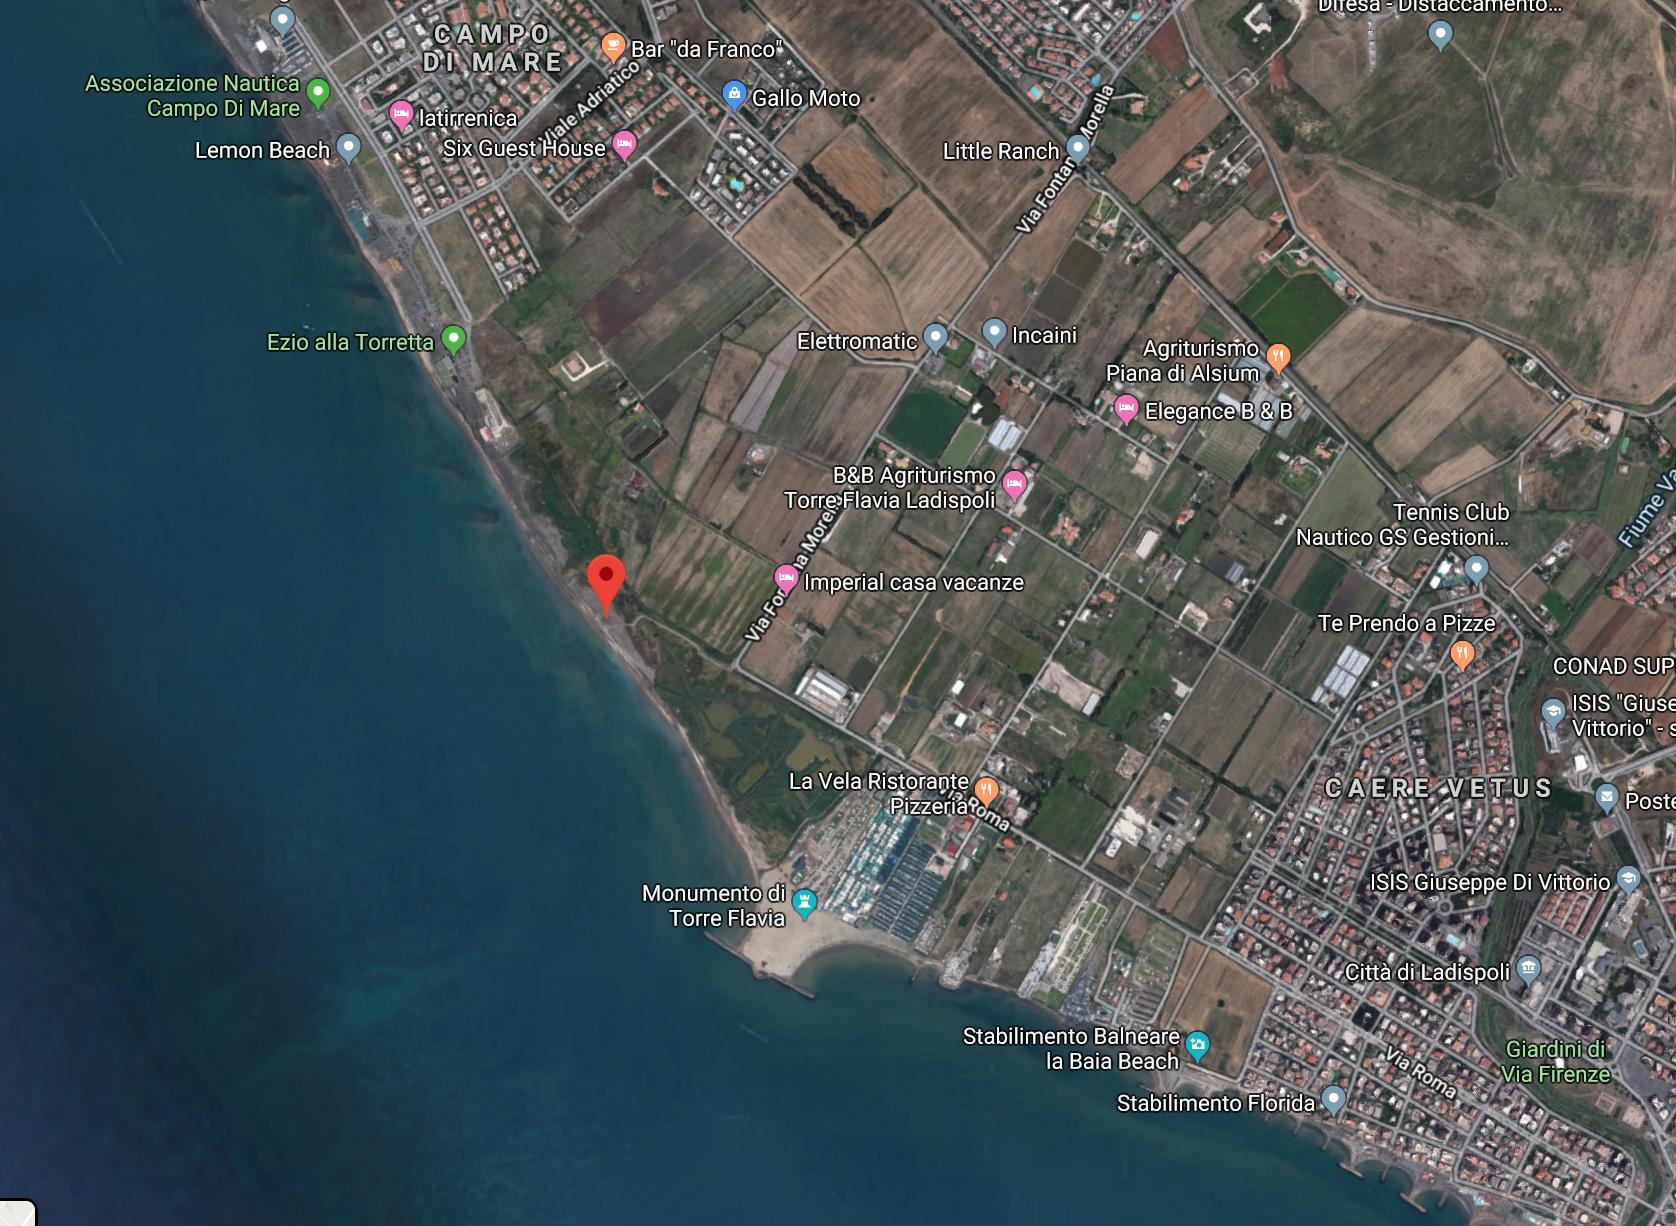 Torre Flavia google map